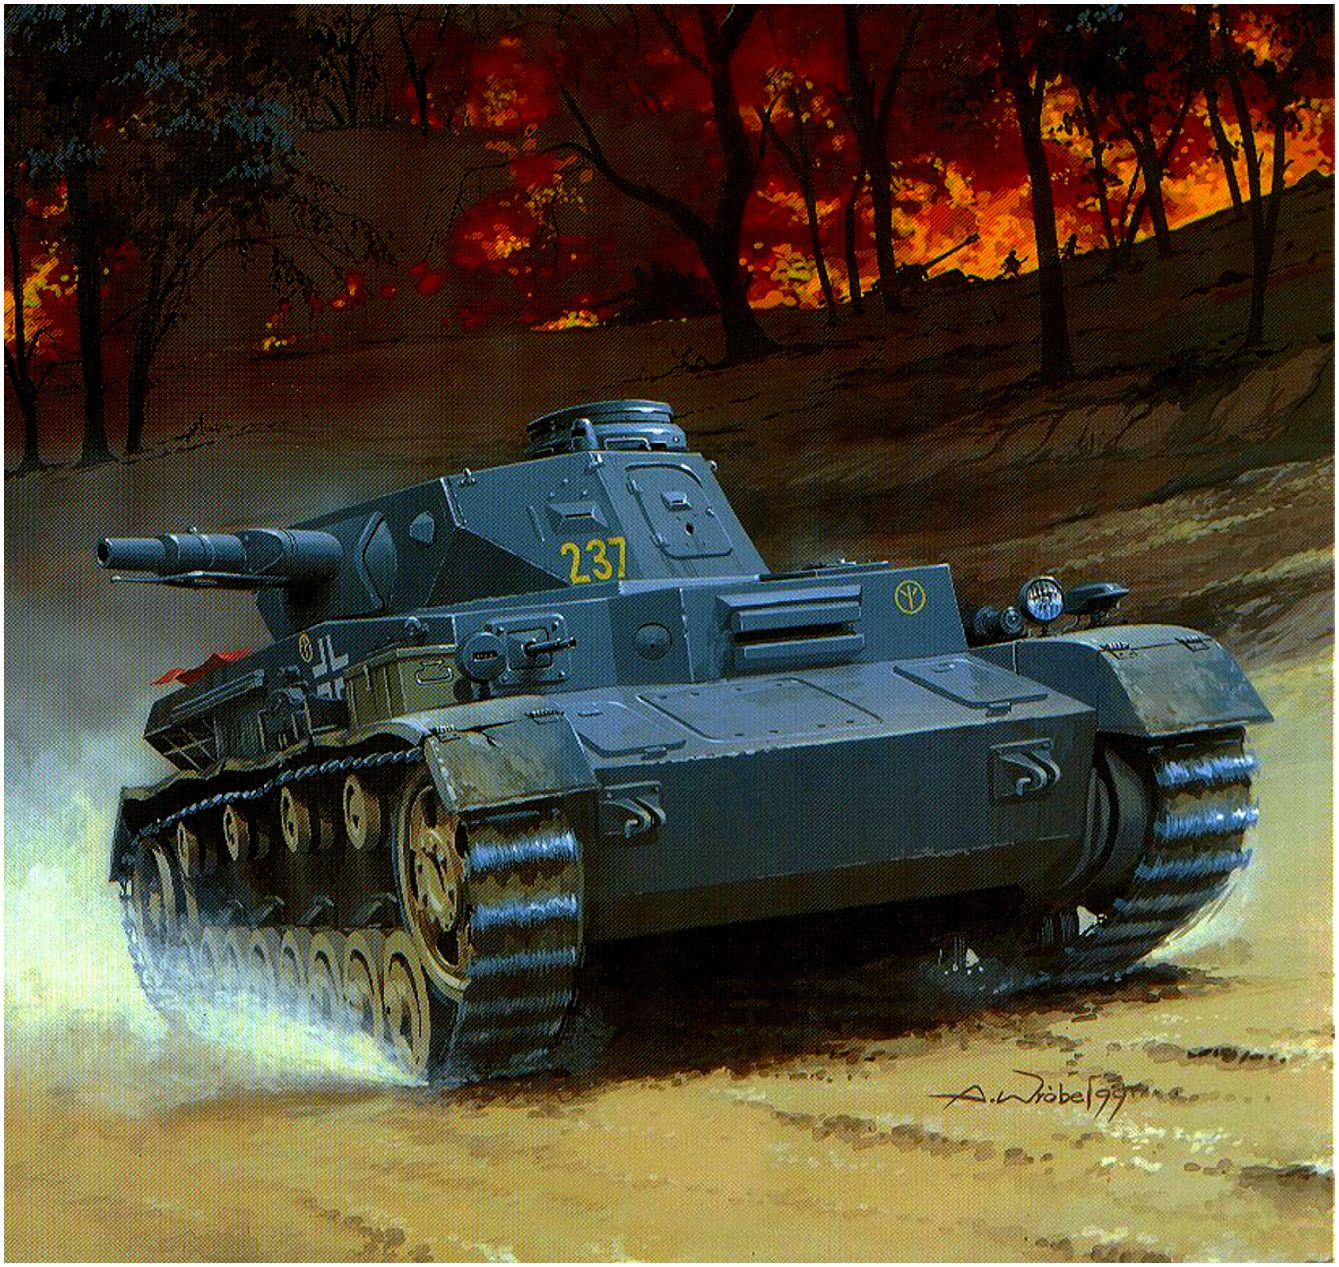 Wróbel Arkadiusz. Танк Panzer IV Ausf. D.